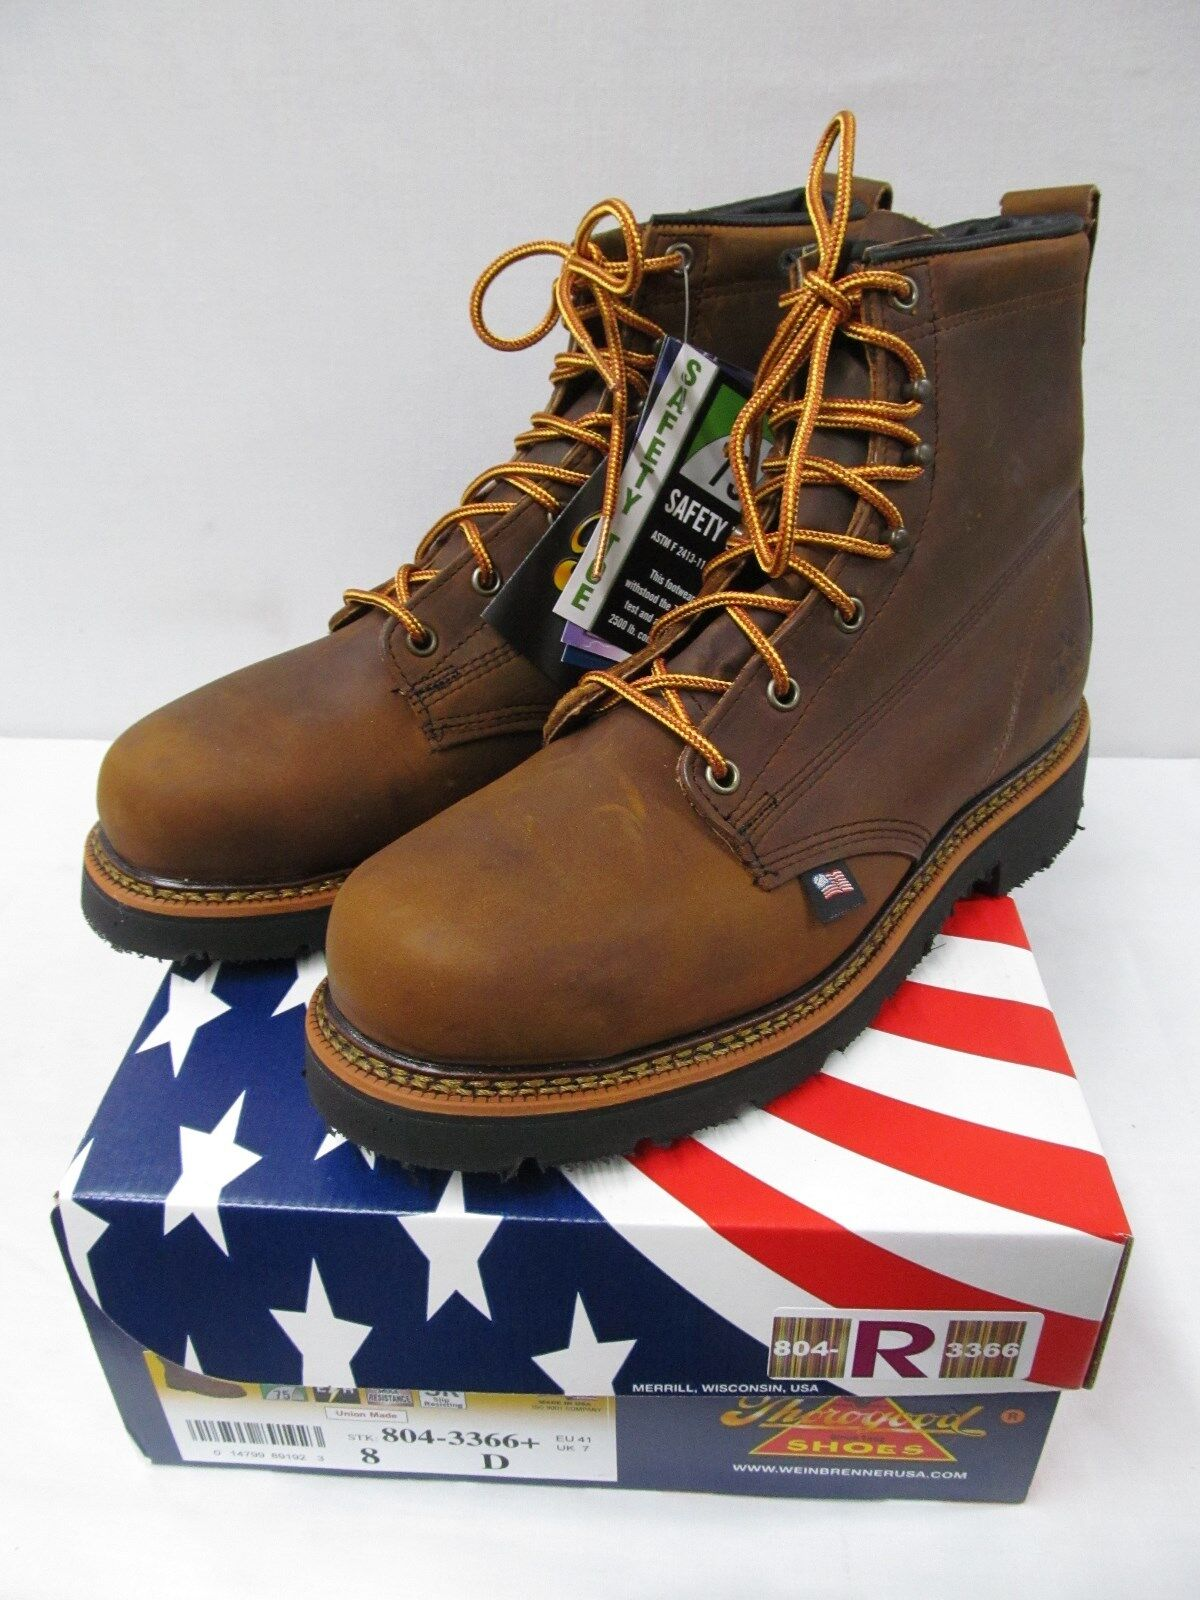 ThGoldgood 6 Inch Plain Steel Toe braun Work Stiefel 804-3366 USA